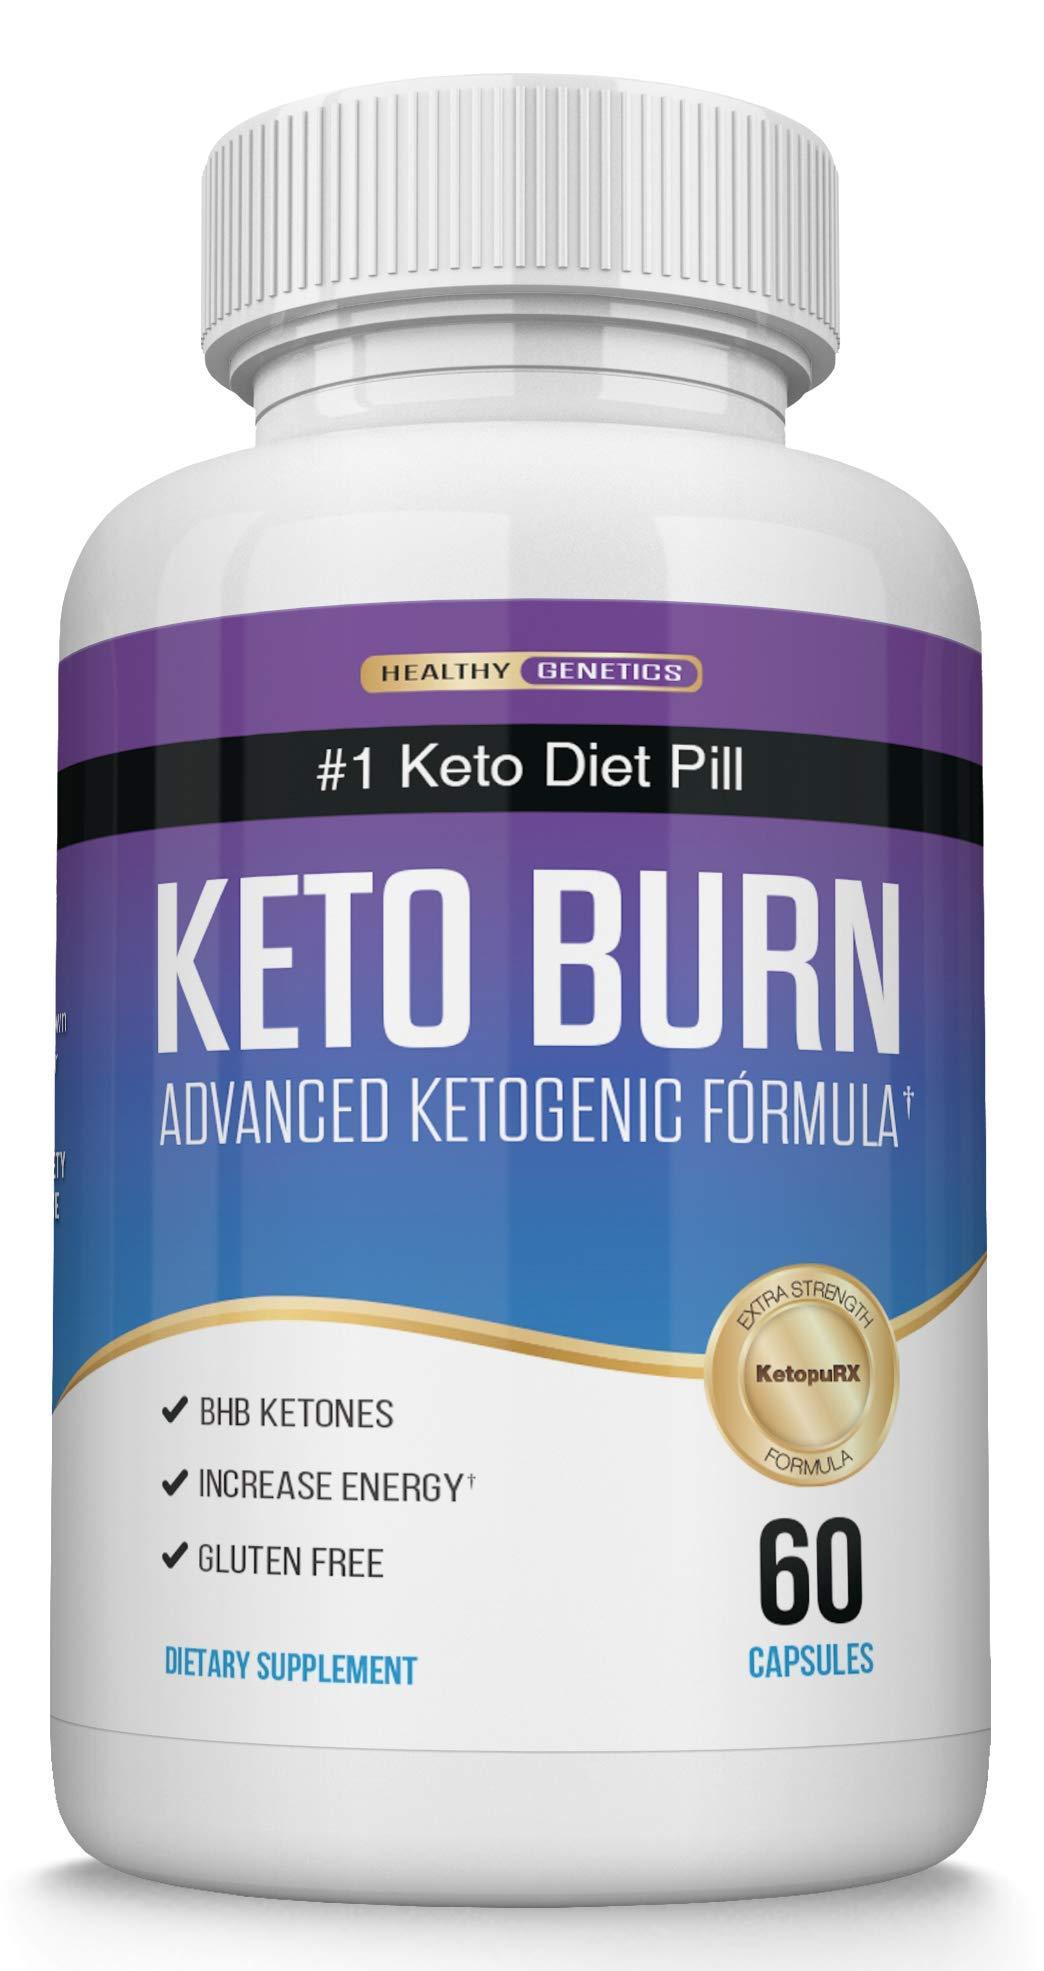 Keto Diet Pills for Keto Diet - Best Keto Pills Keto Supplement with Exogenous Ketones - Ketogenic Diet Supplement for Energy, Focus and Endurance by Healthy Genetics